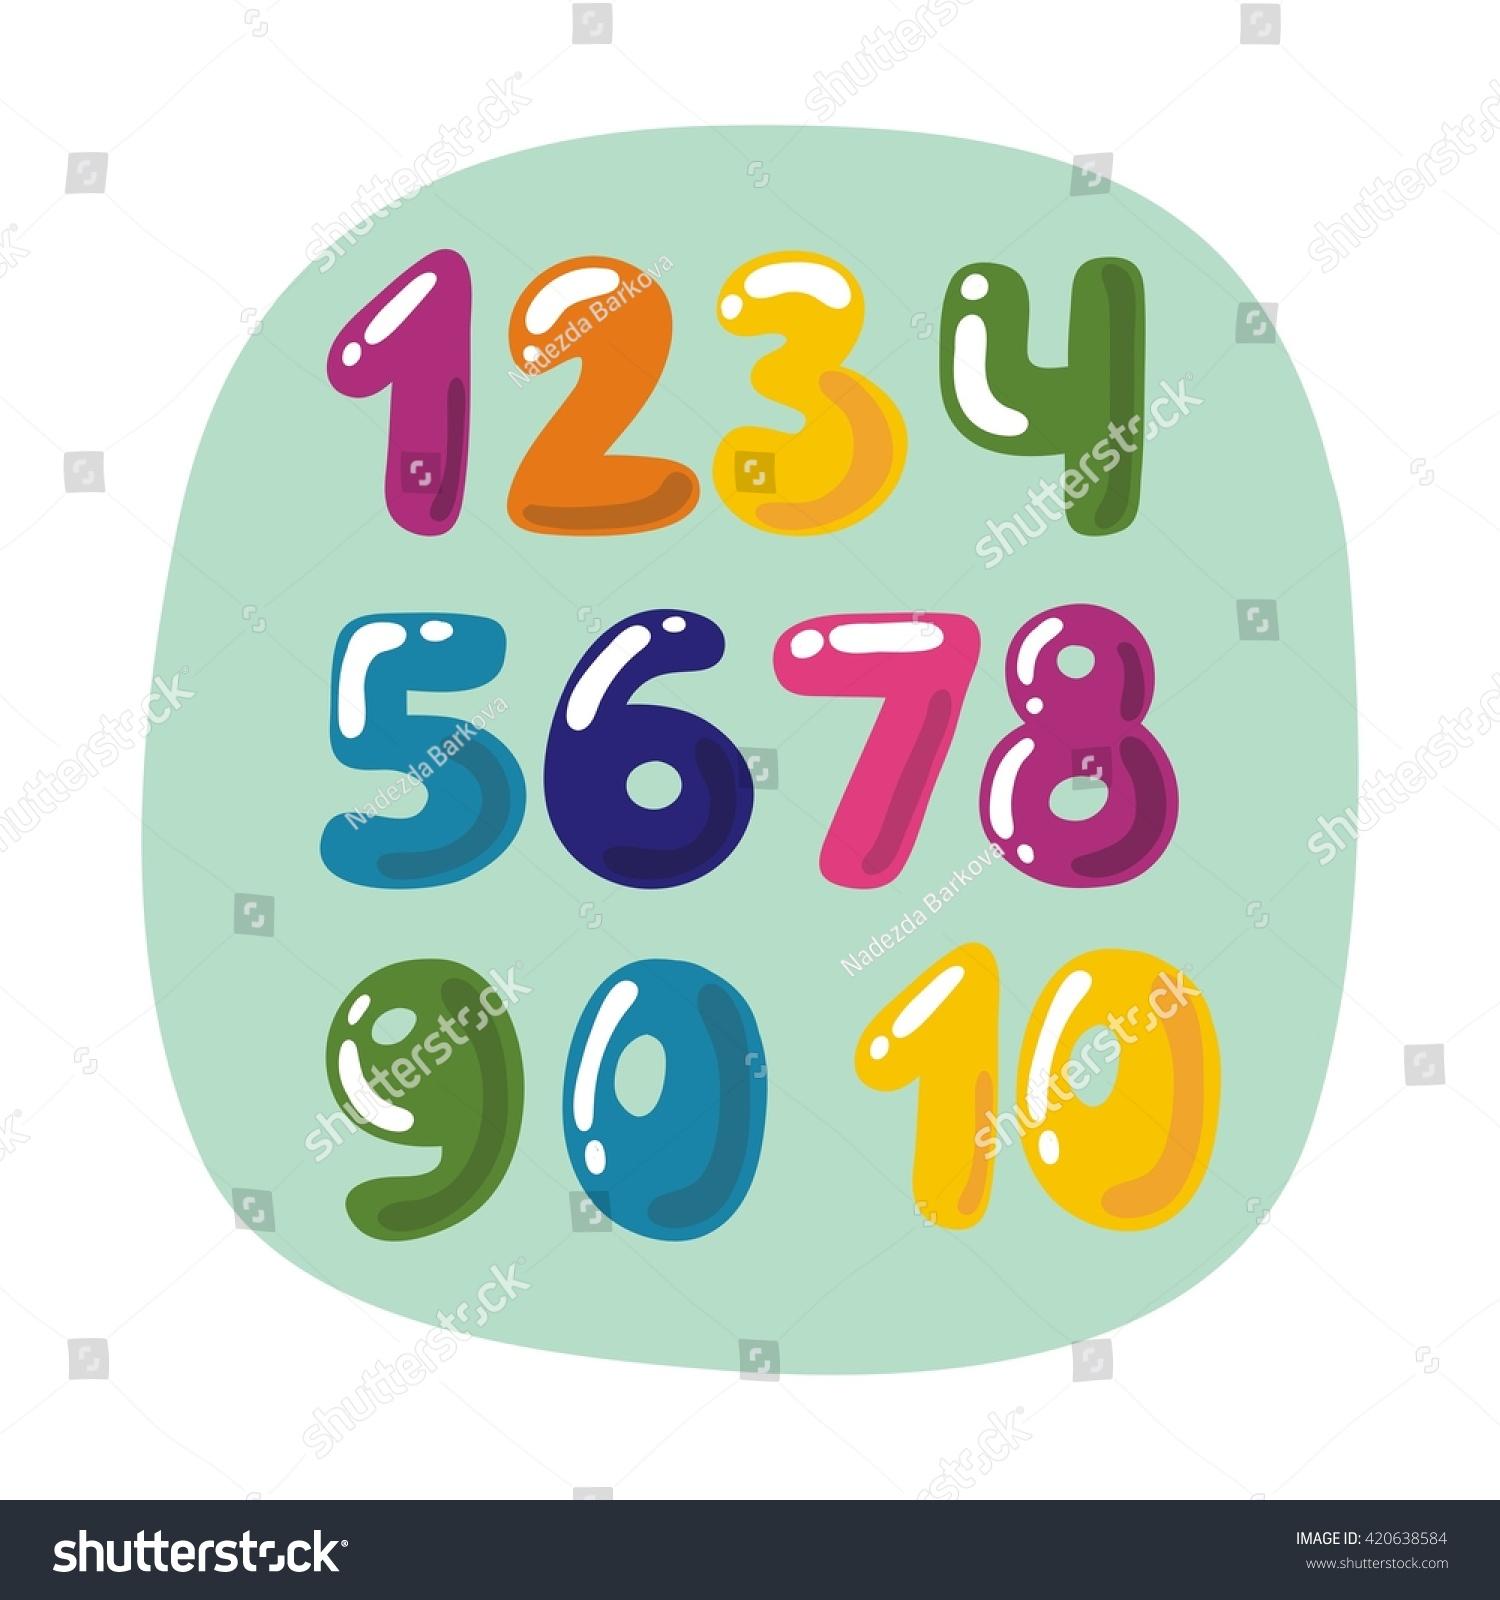 Colorful Children Numbers Stock Vector (2018) 420638584 - Shutterstock